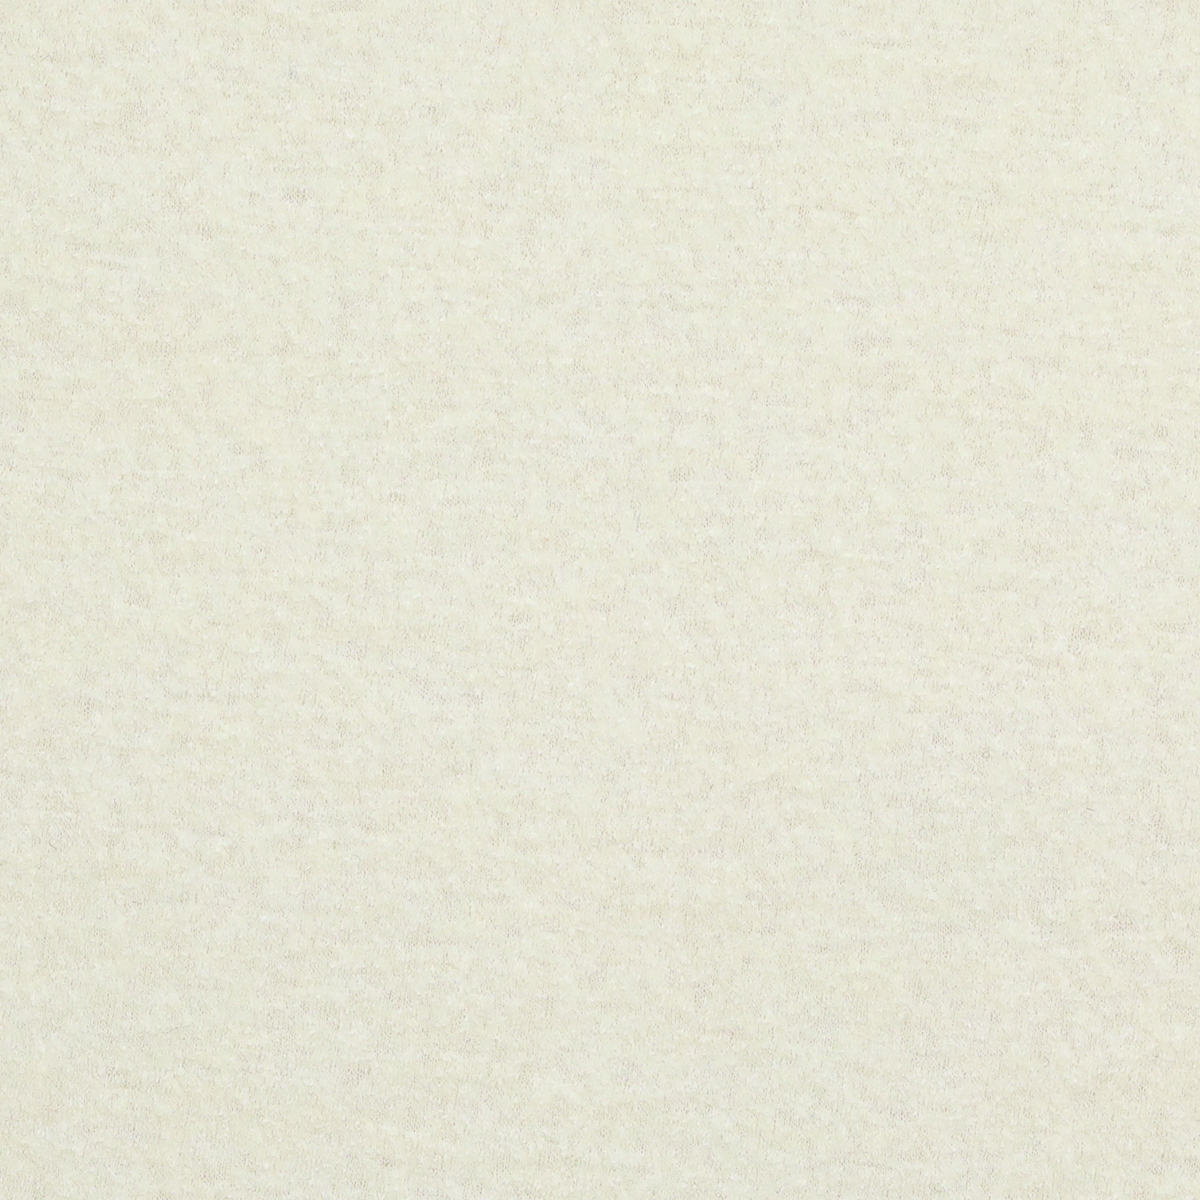 Вискозно-шерстяной лоден